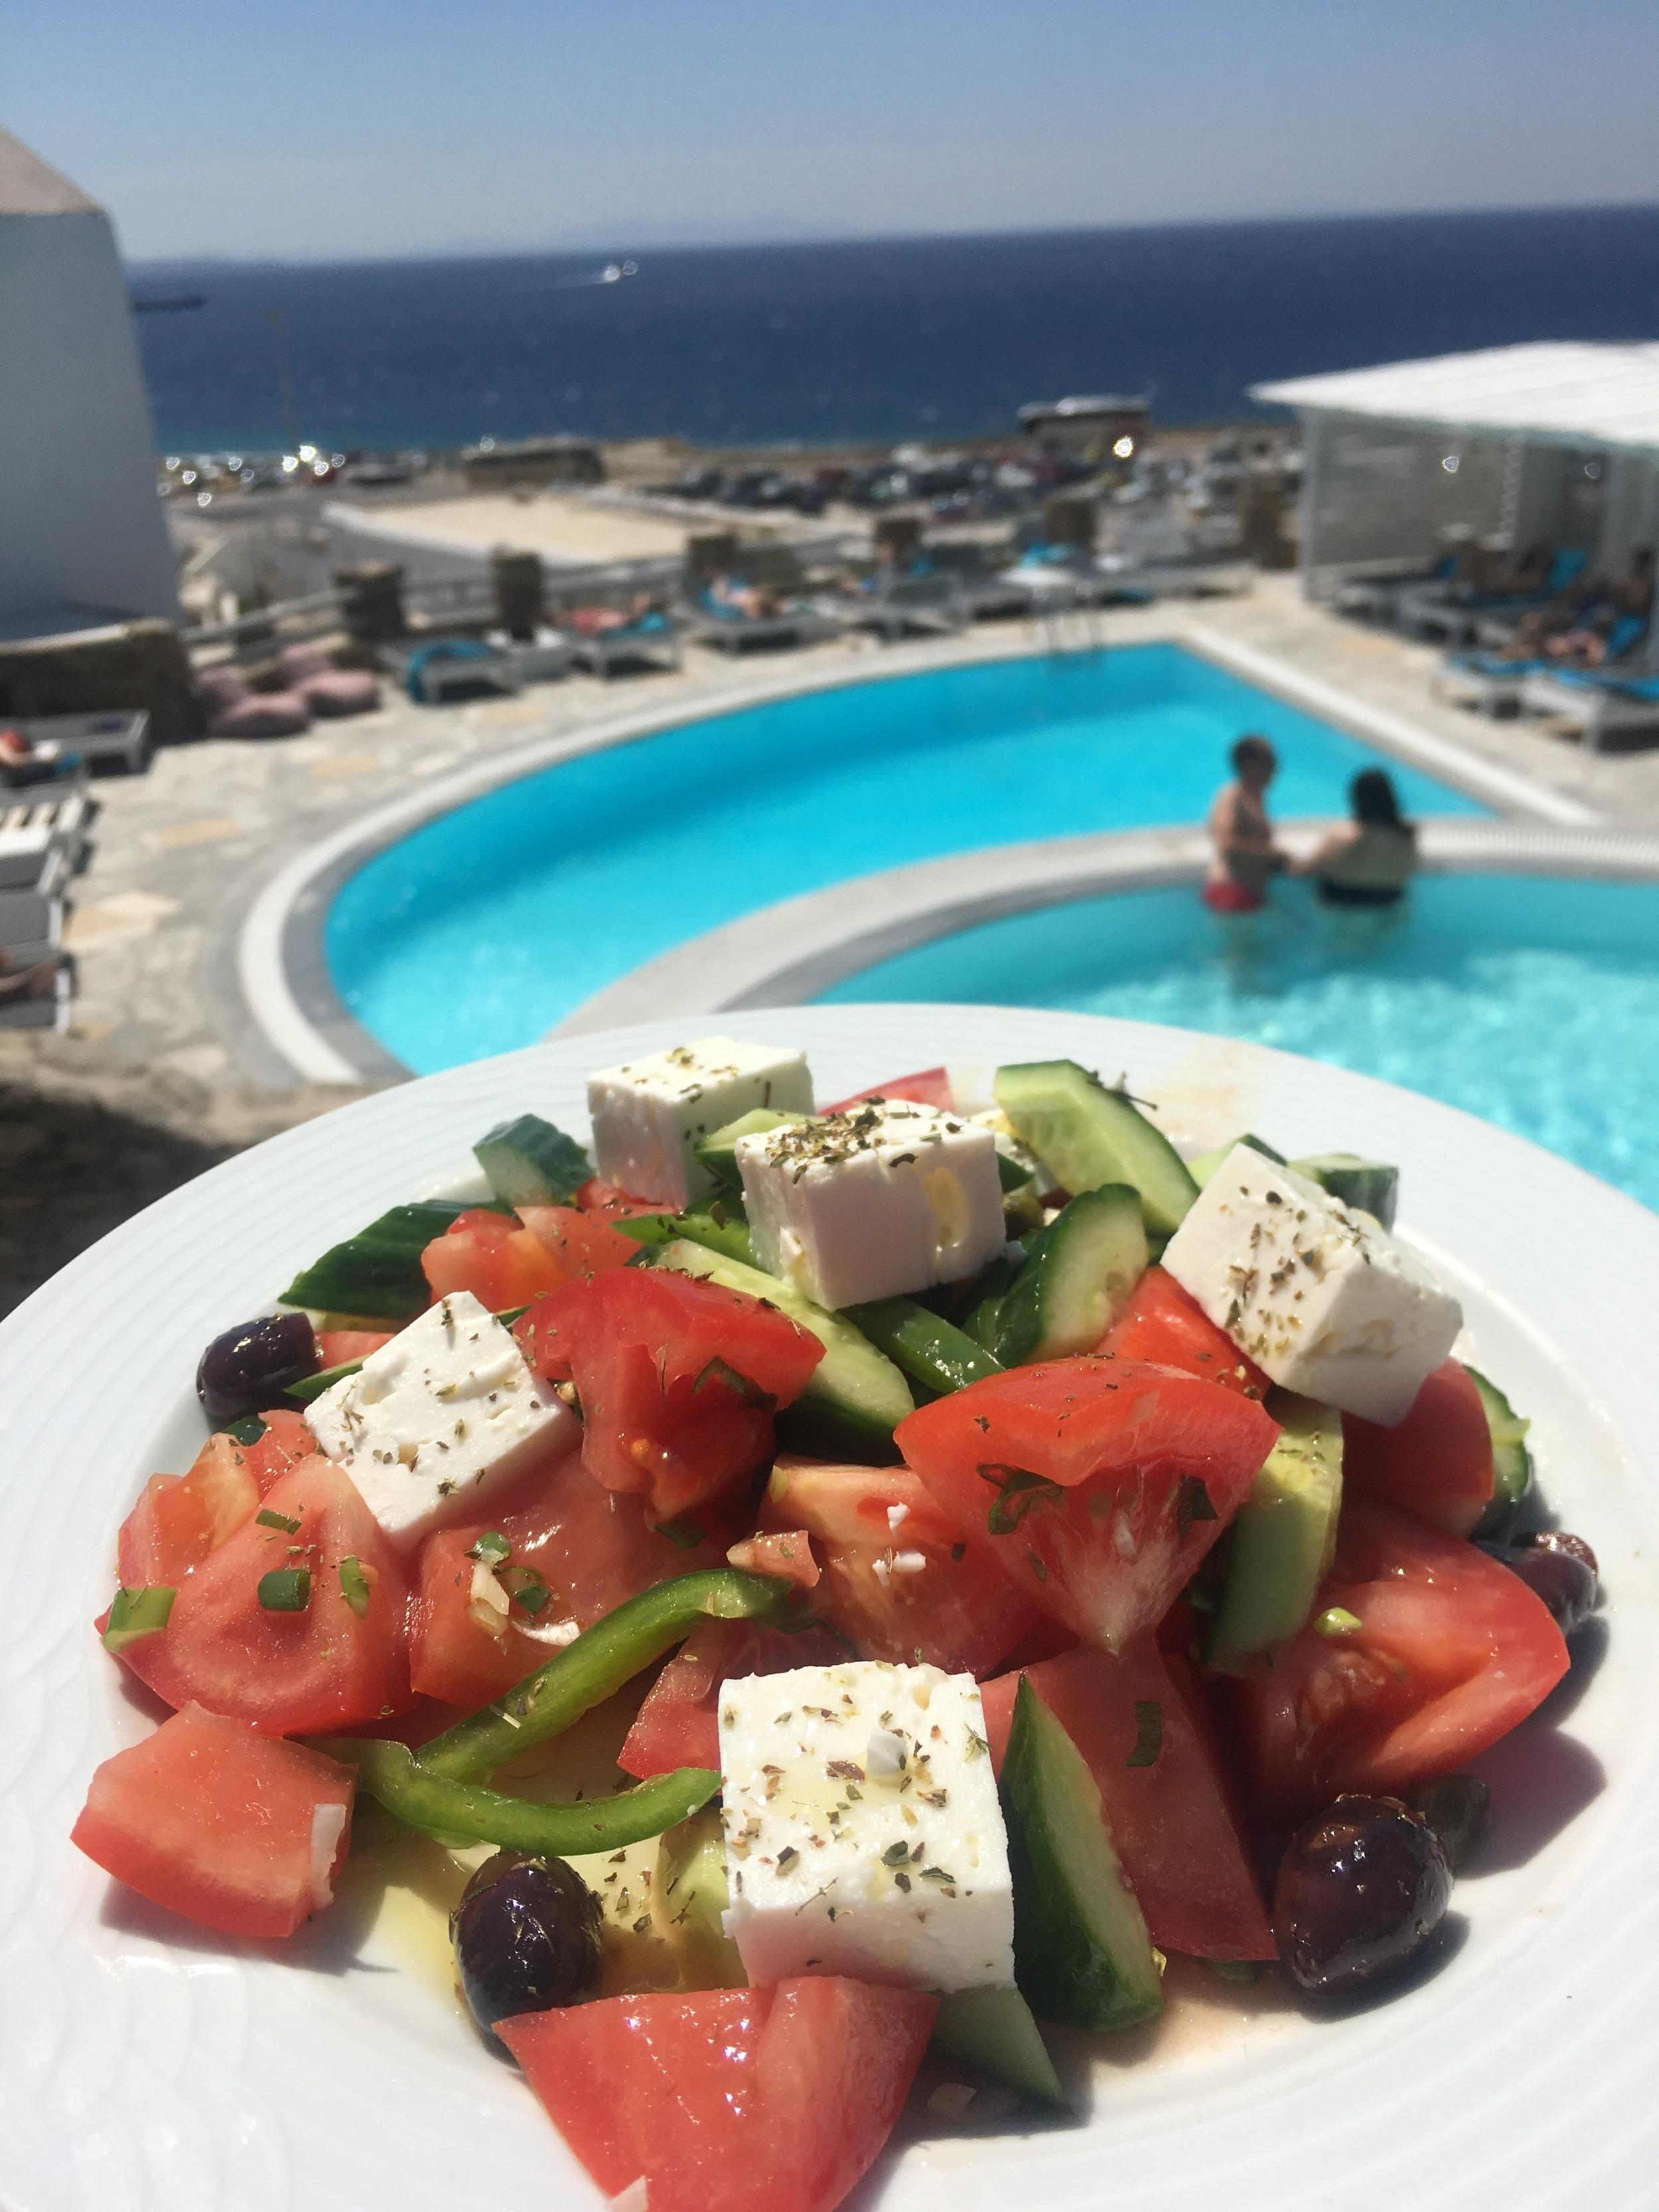 Those Greek salads